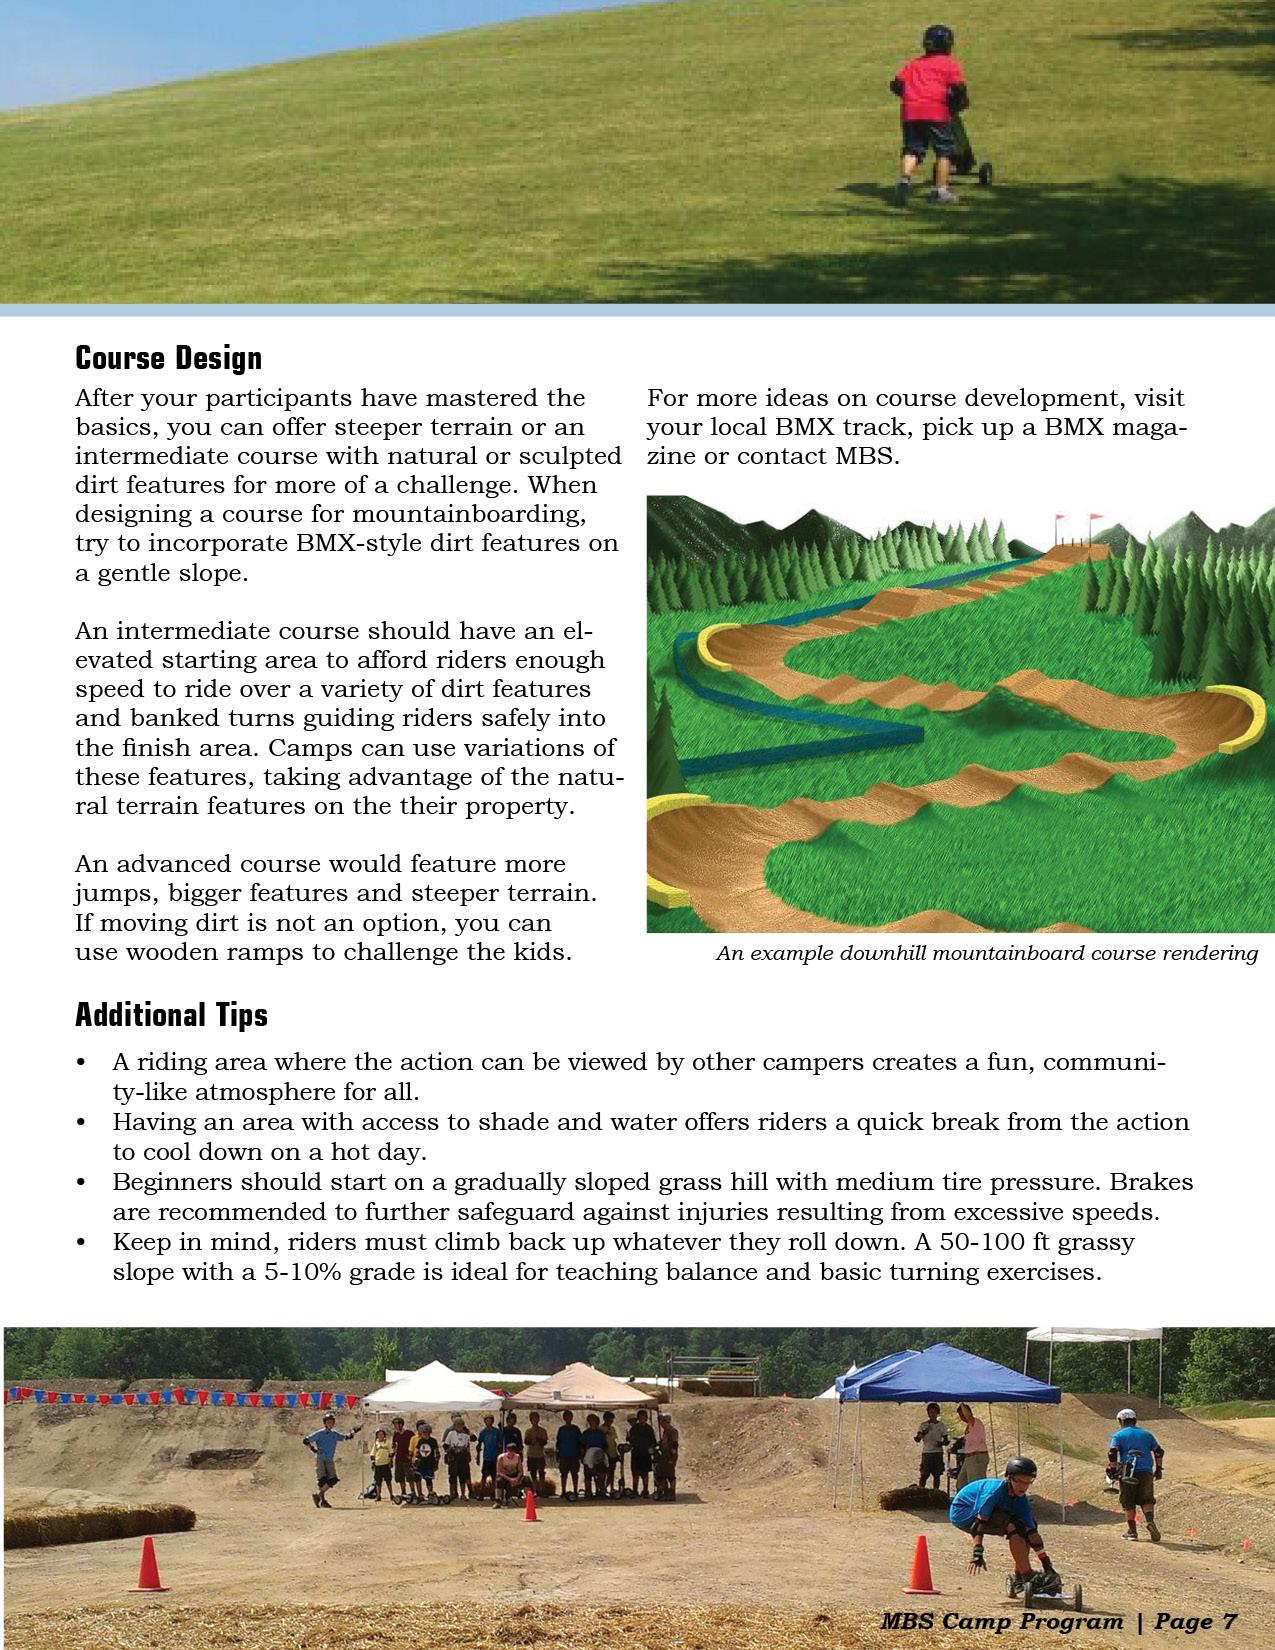 MBS Camp Program - Manual - Final Draft7.jpg